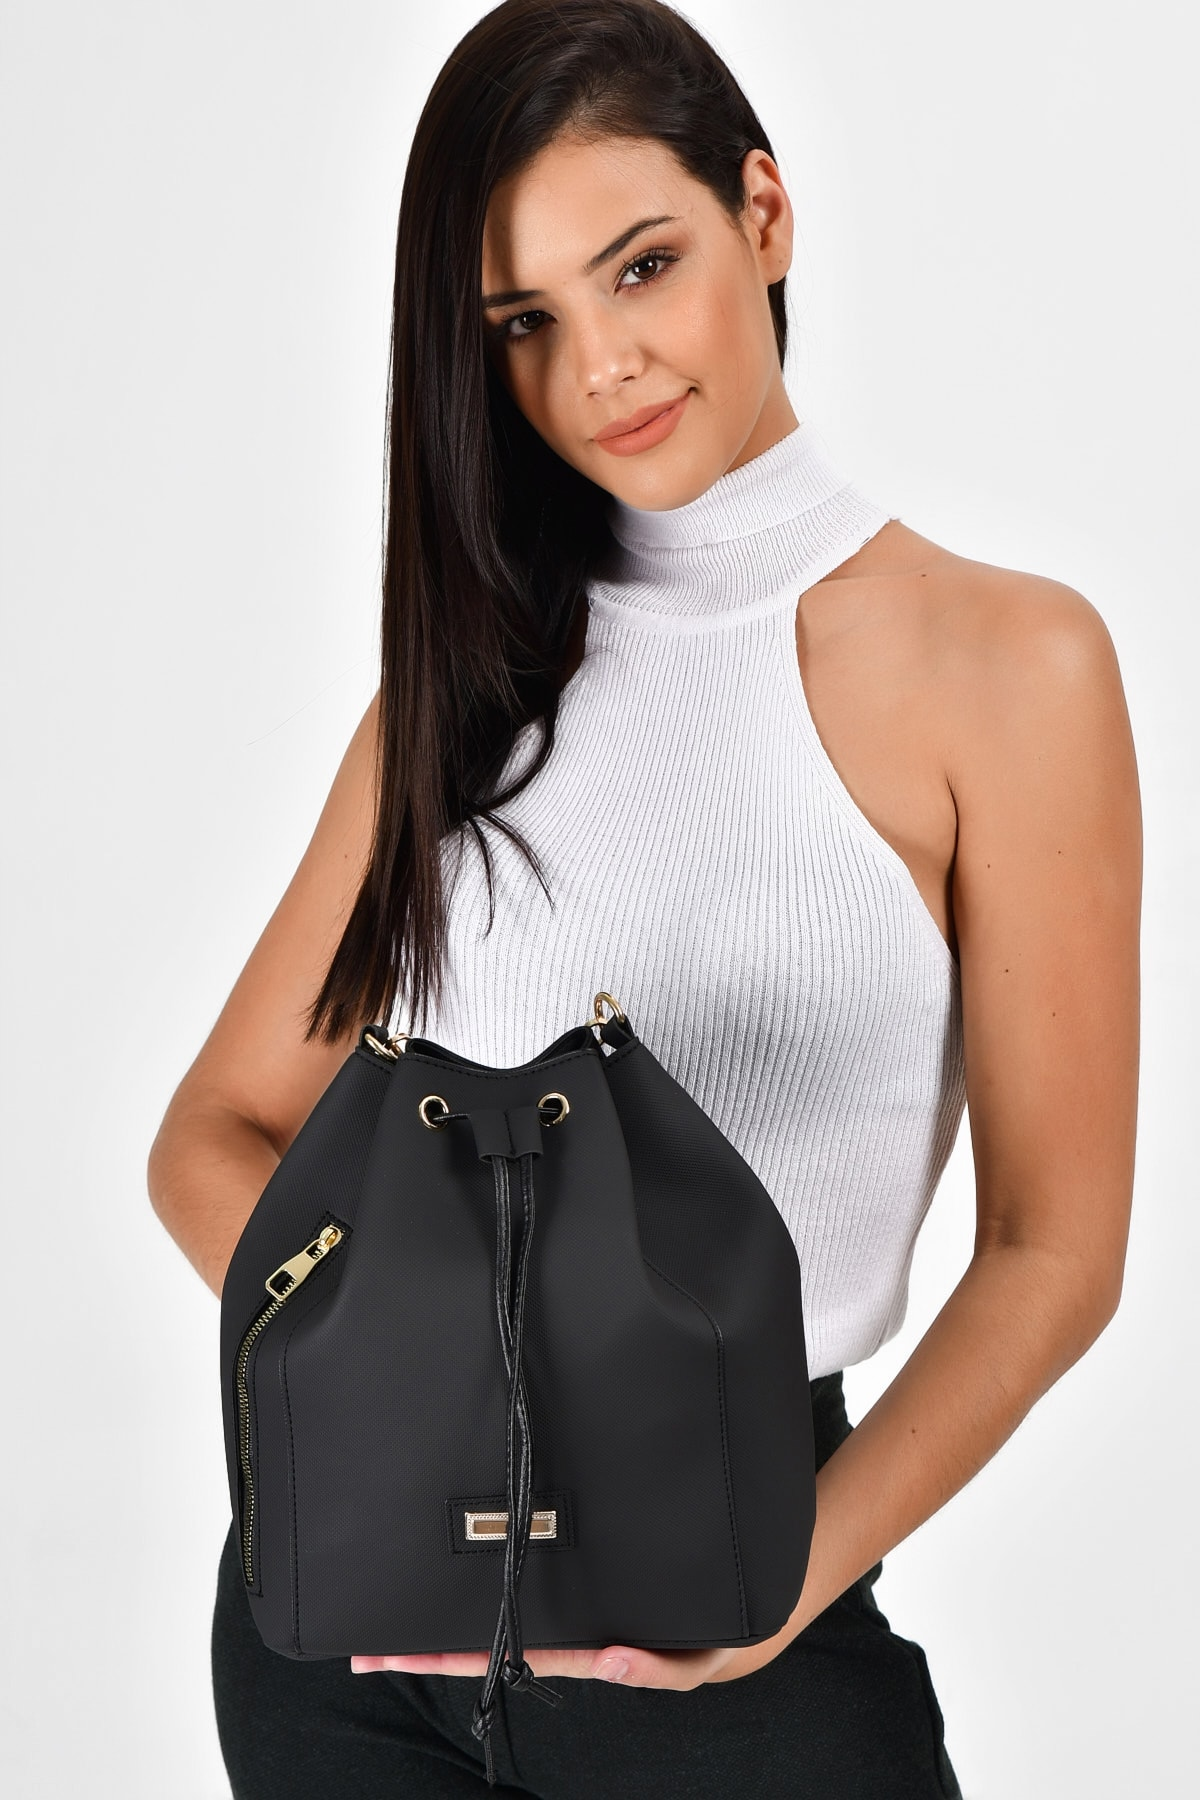 Bagzone Gathered Zipper Detailed Shoulder Bag,Women's bag,сумка женская,Handbags,Bags for women,shoulder bag leather,Women's bra